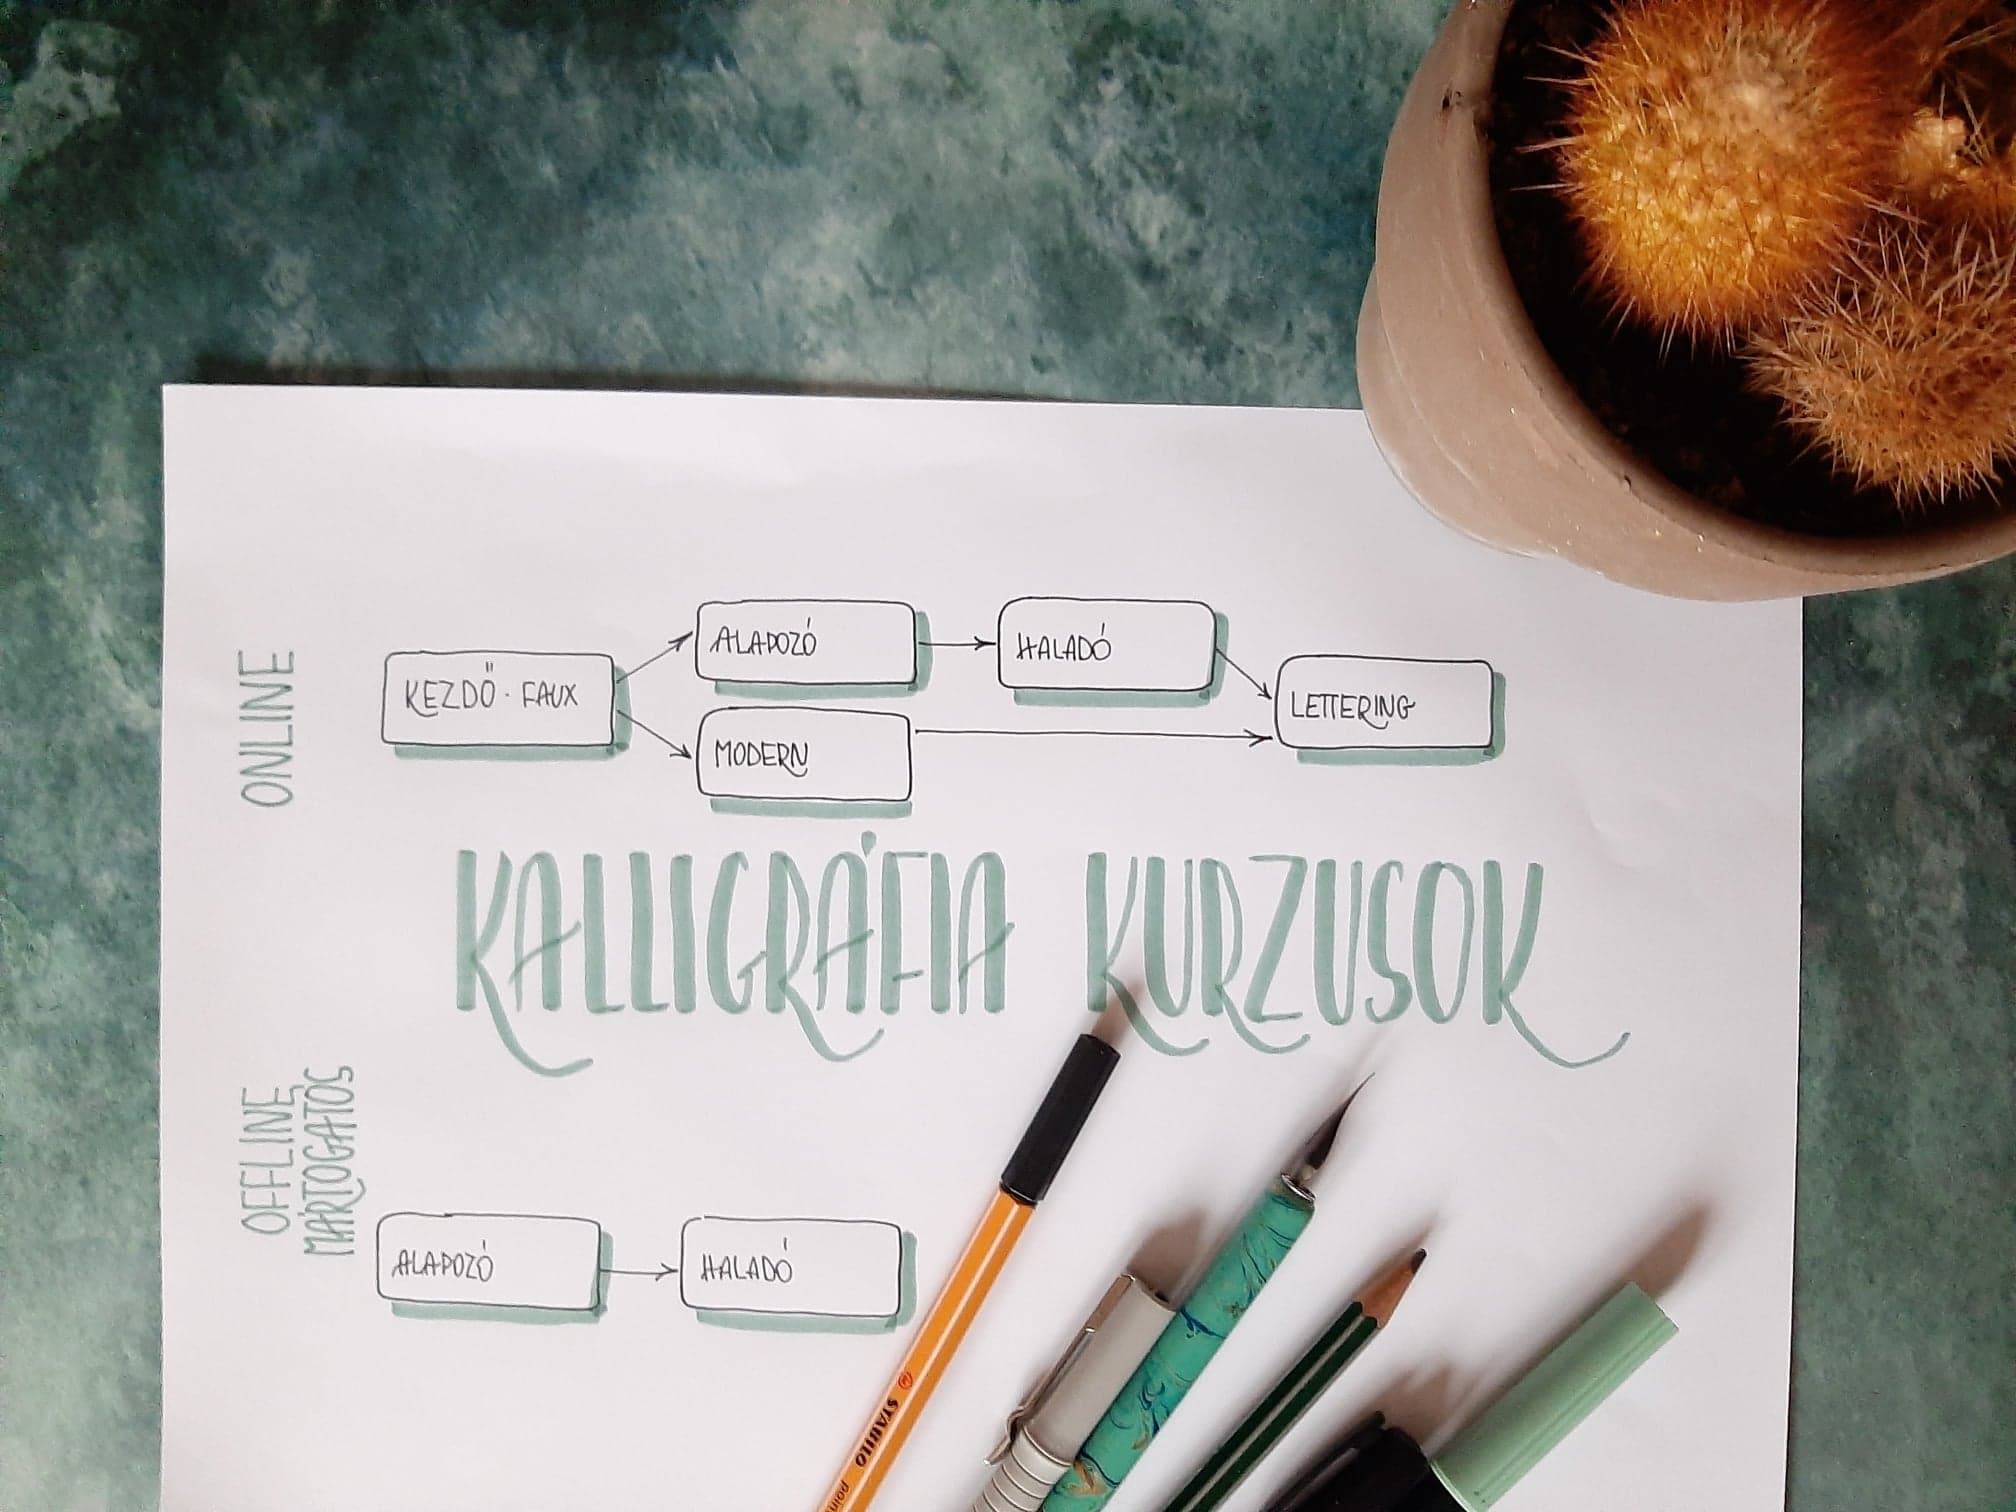 kalligráfia kurzusok